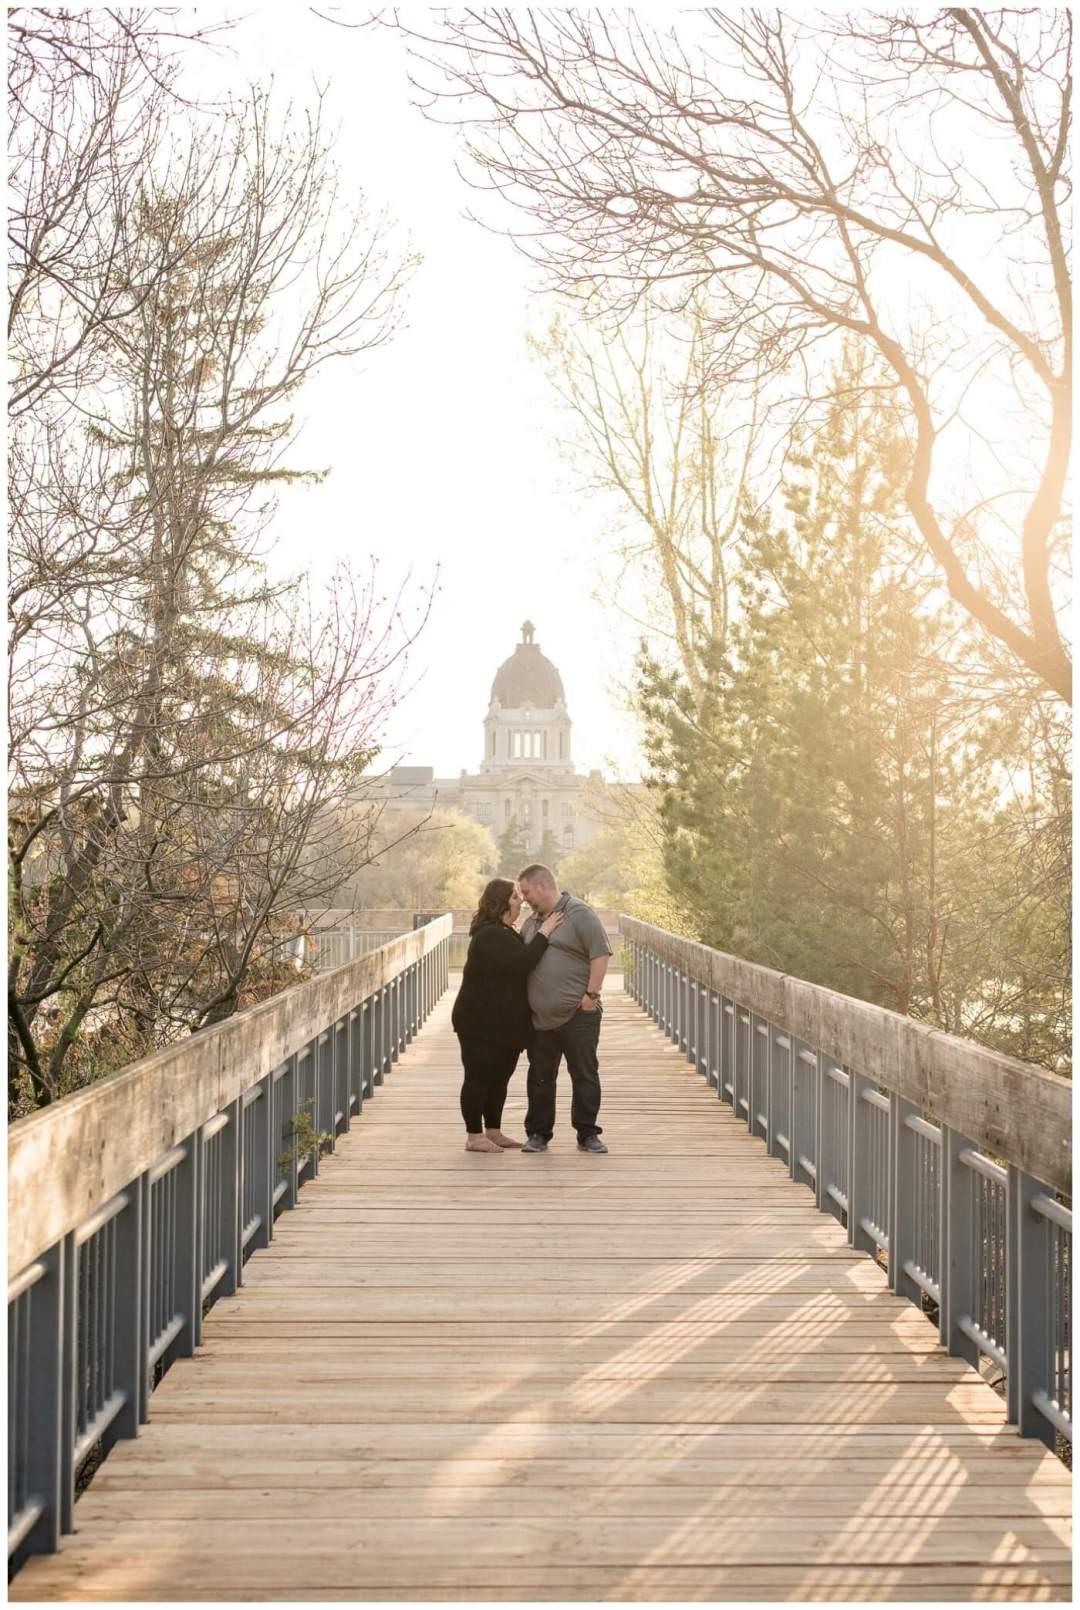 Regina Engagement Photographer - Scott-Ashley - Trafalgar Outlook - Wascana Centre